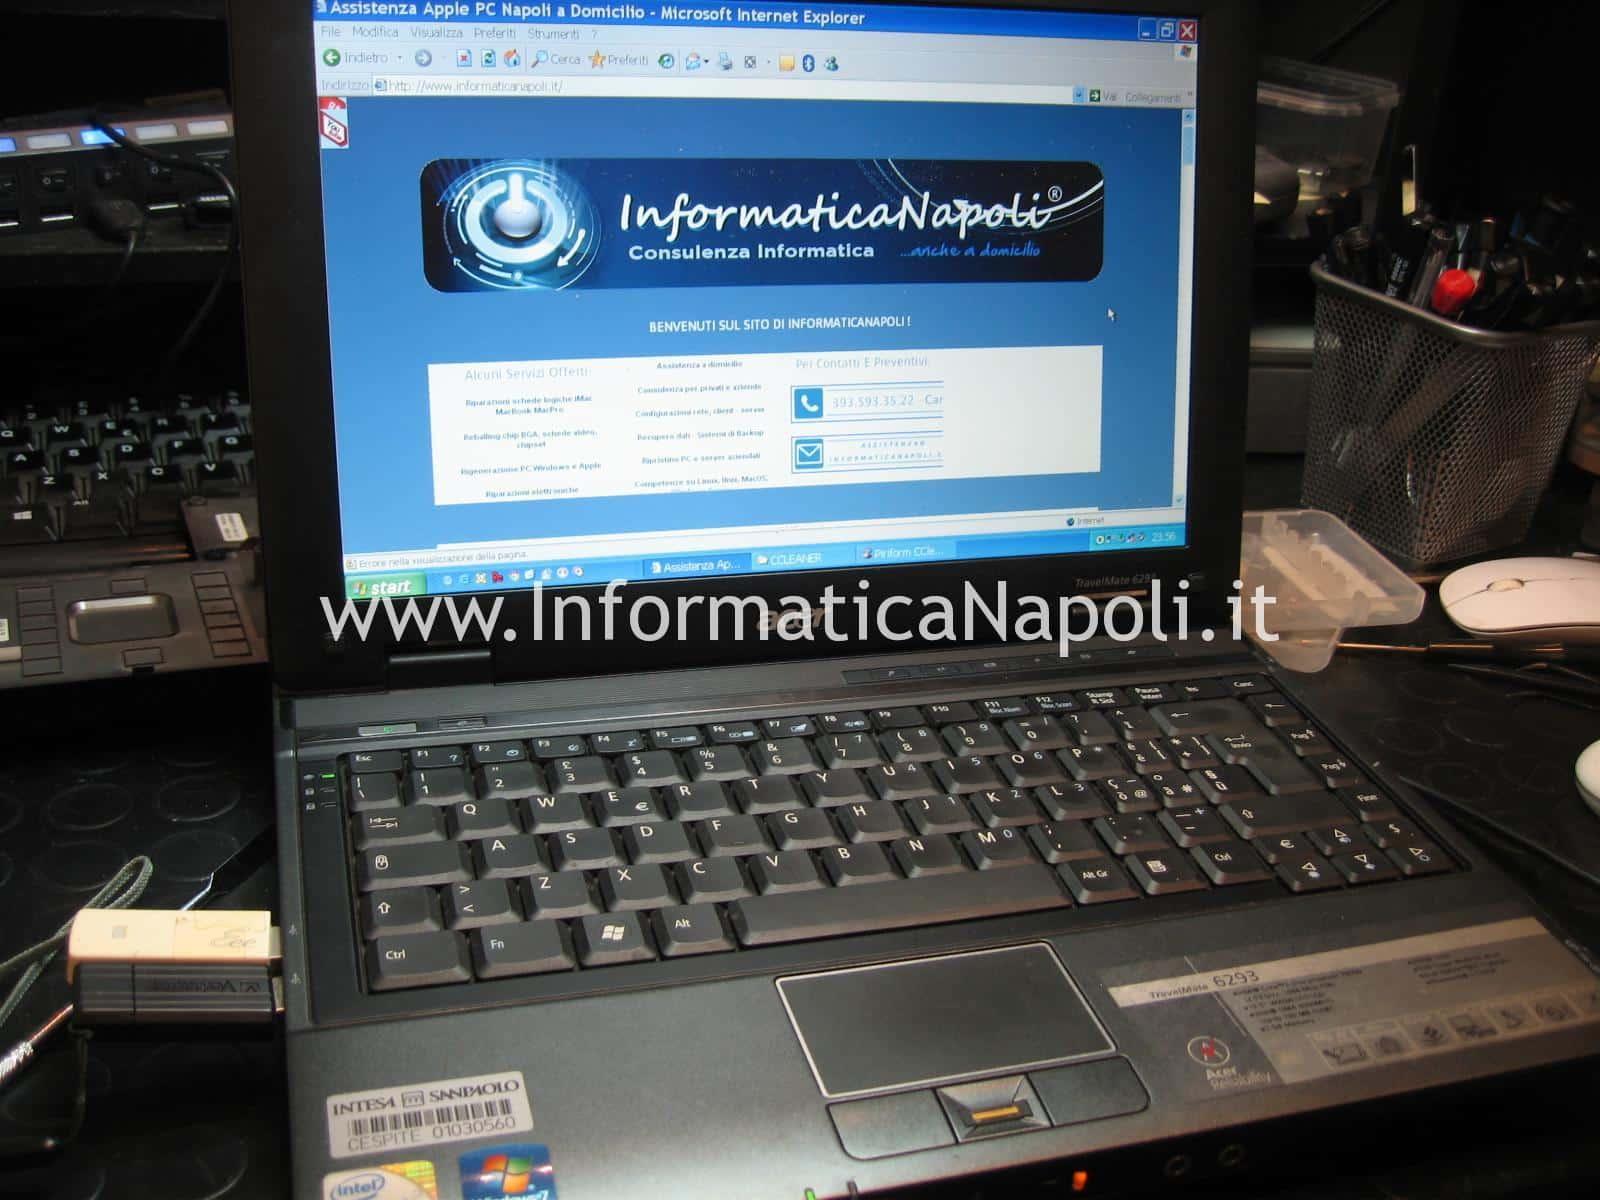 Assistenza Acer TravelMate 6293 napoli